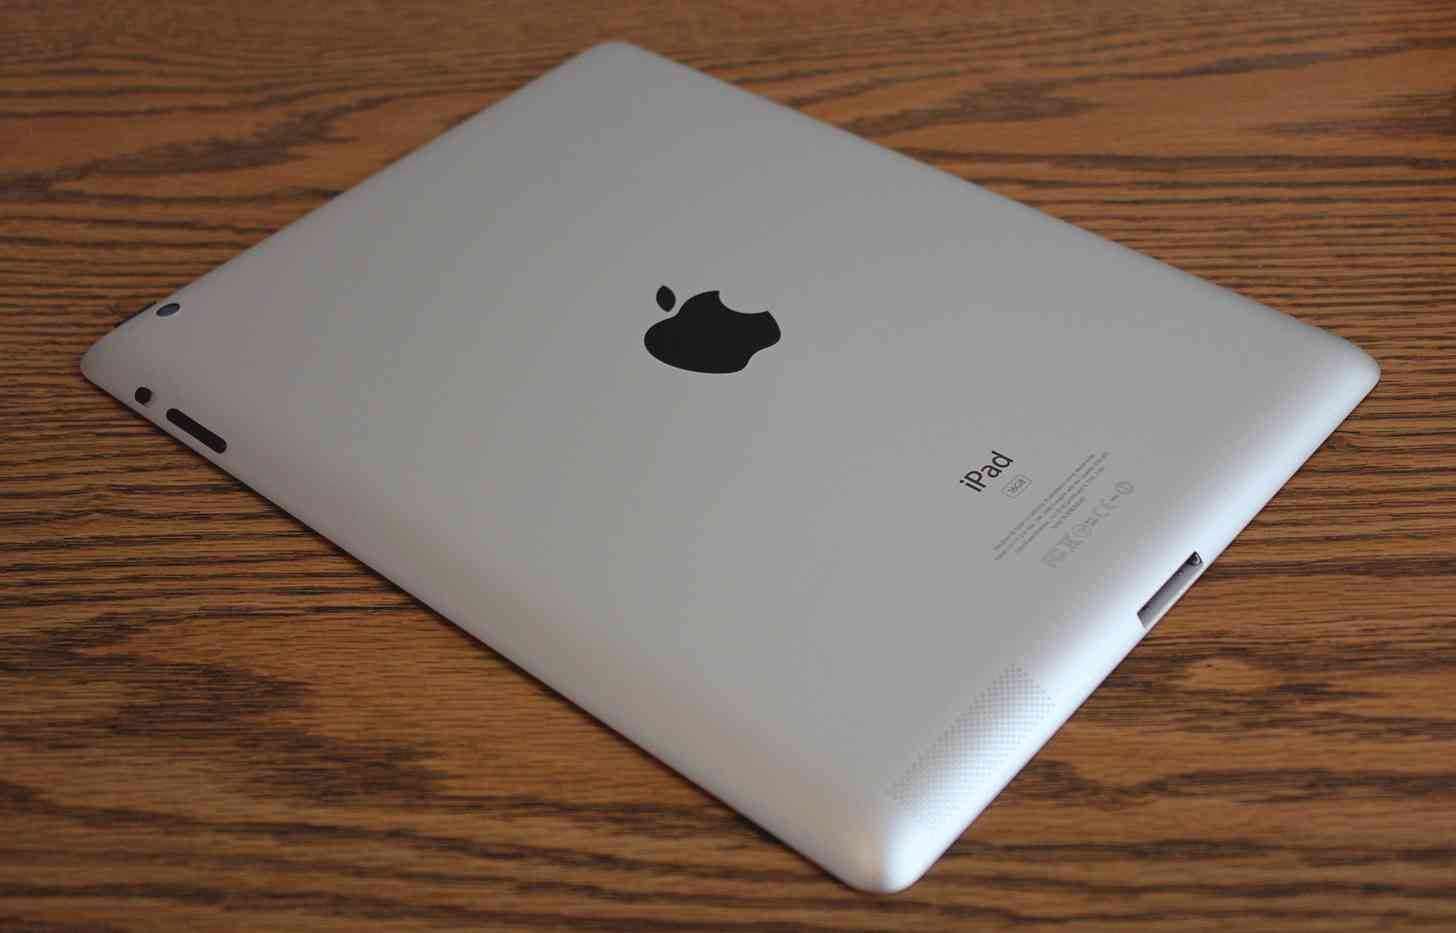 Apple iPad rear